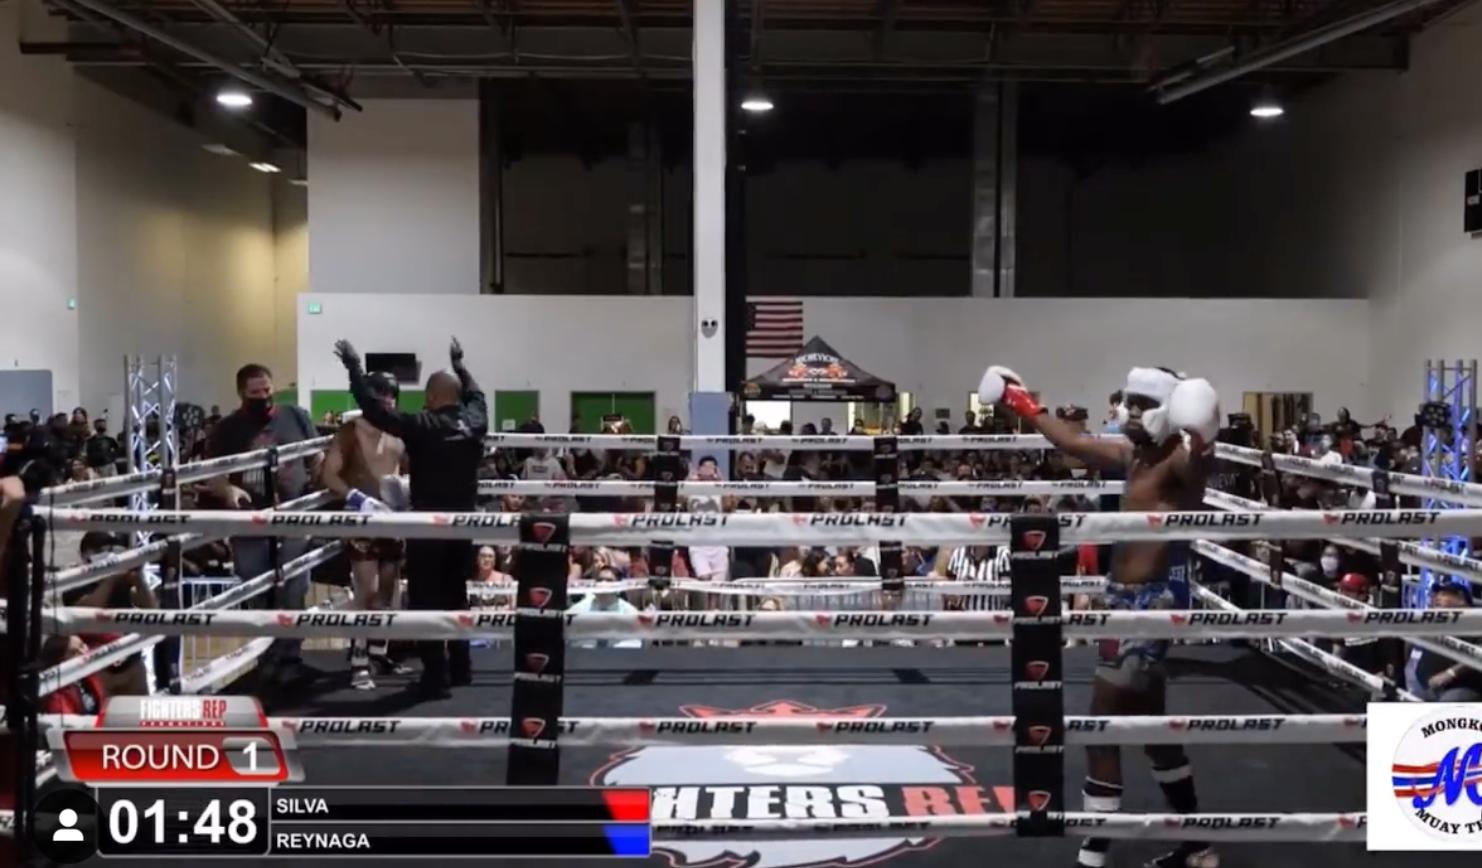 Anderson Silva's son Kalyl won his kickboxing debut.